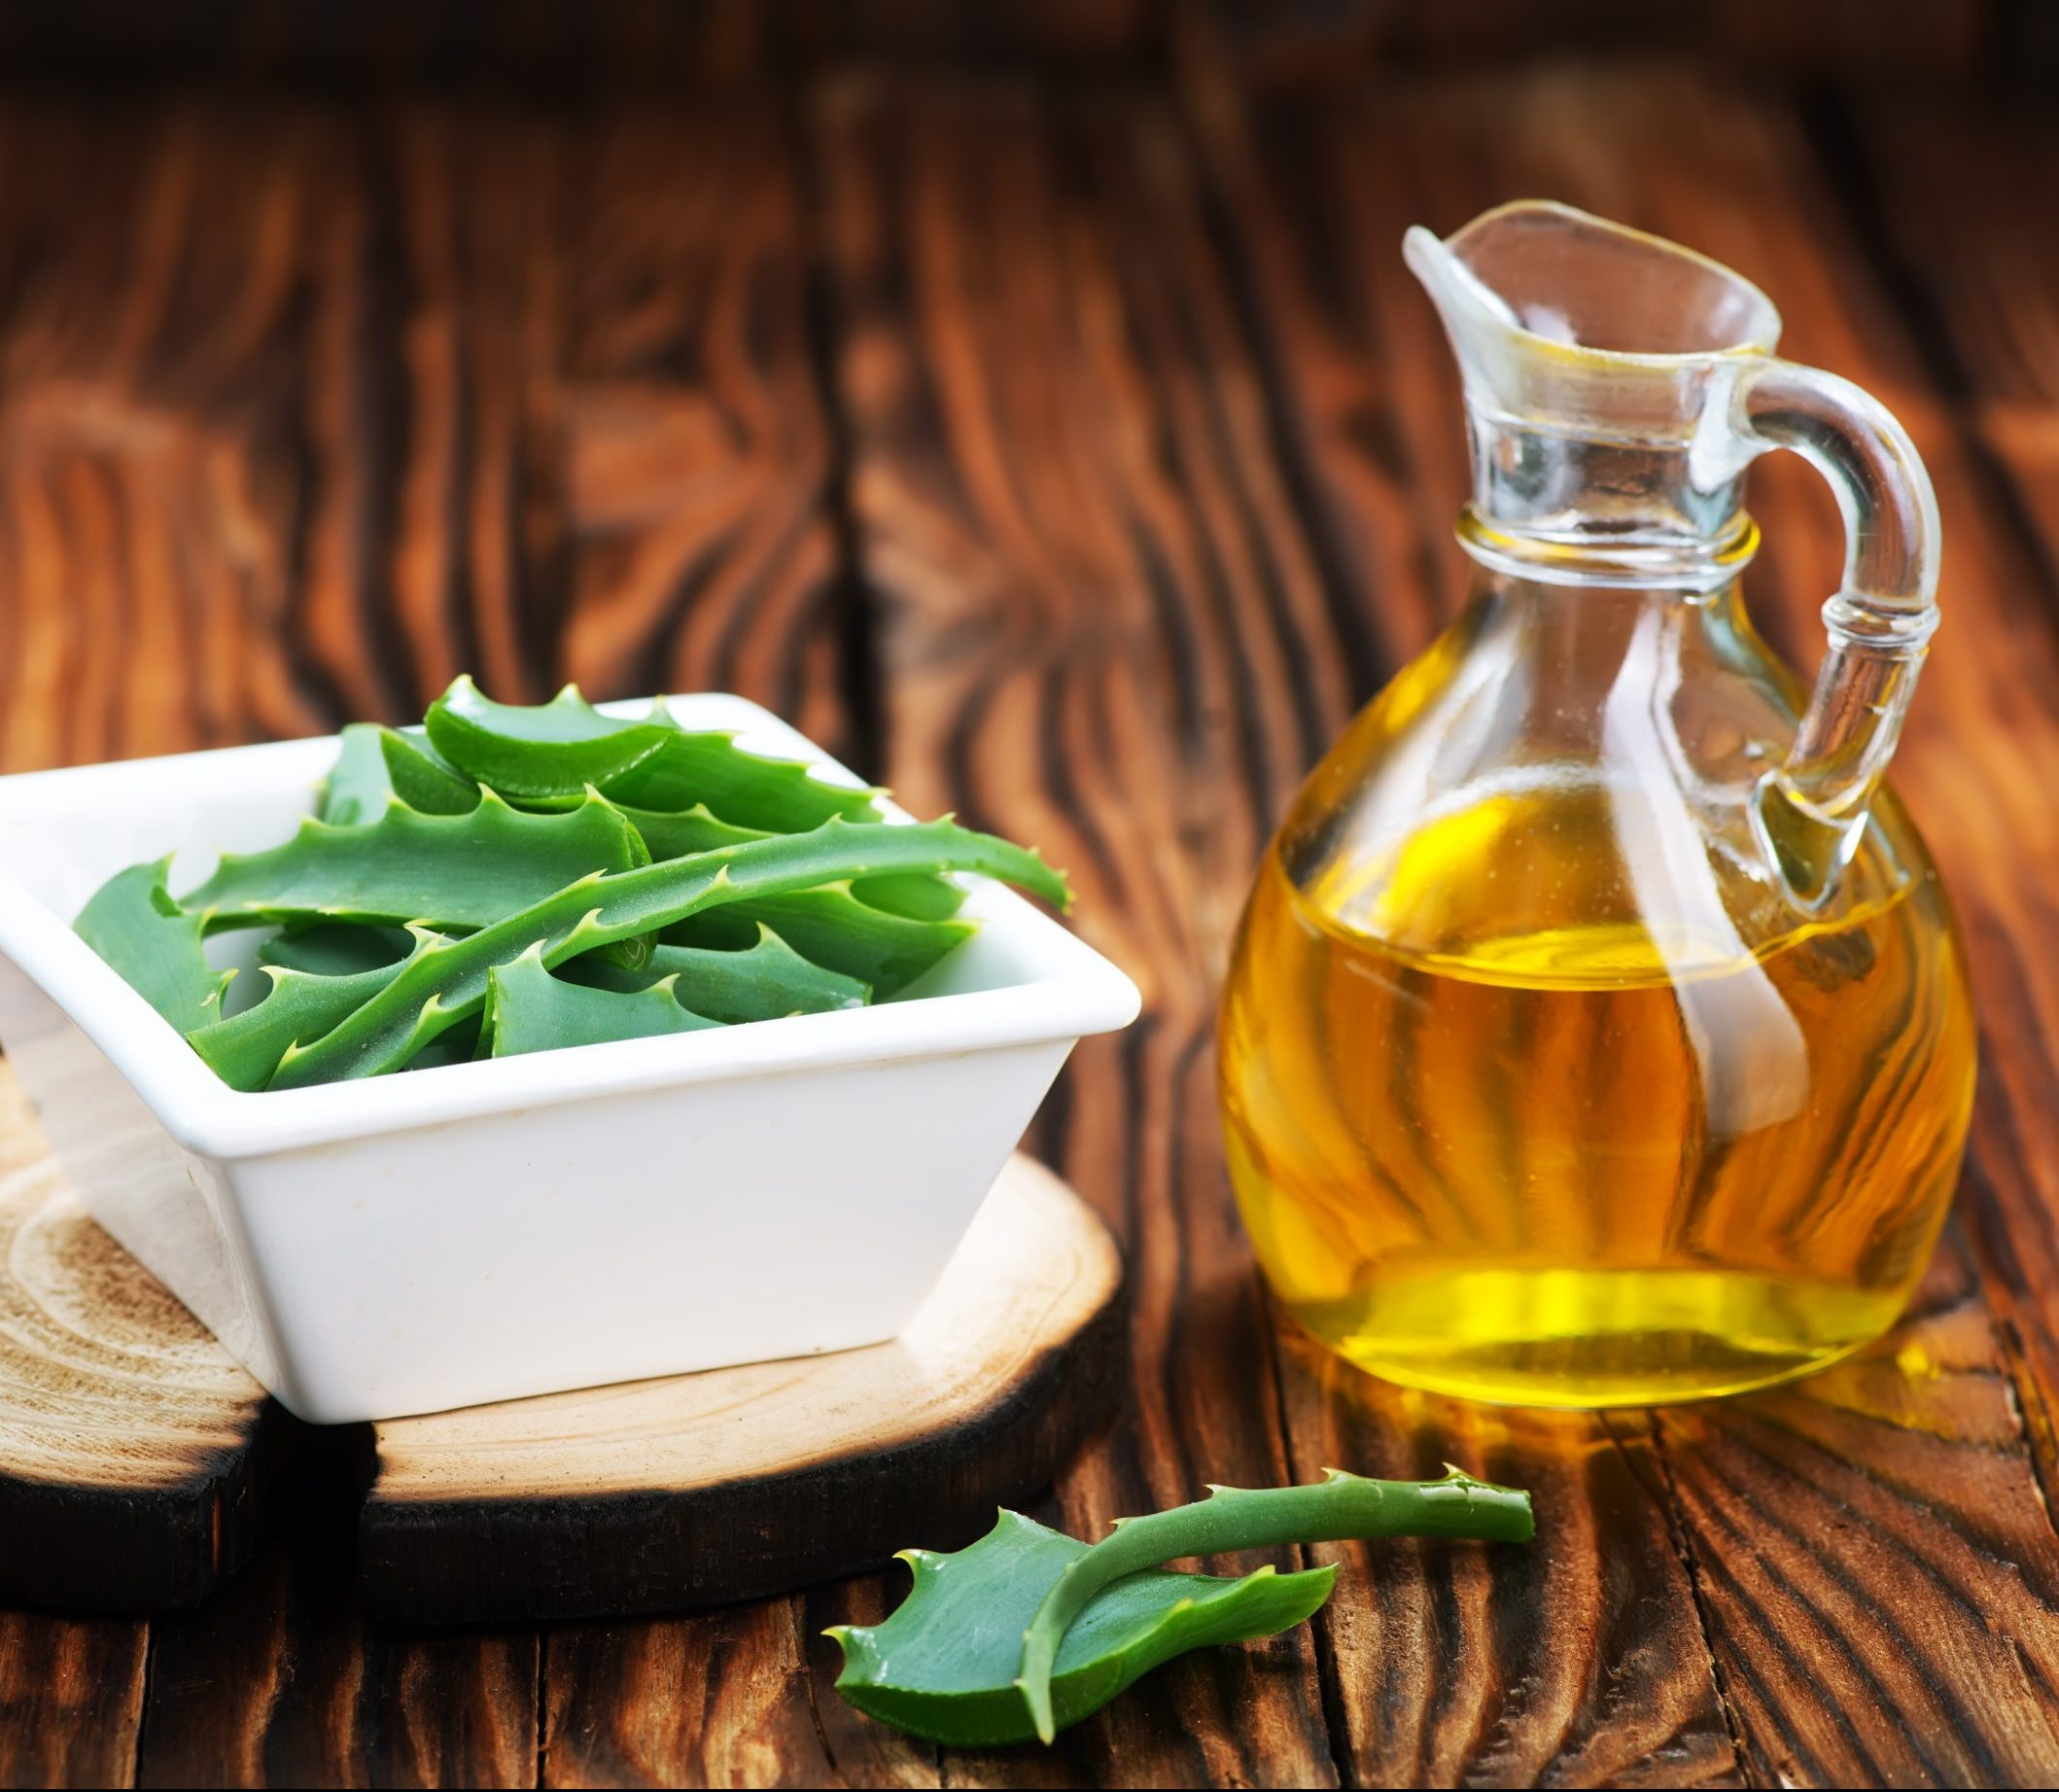 aloe vera and aroma oil in bottle